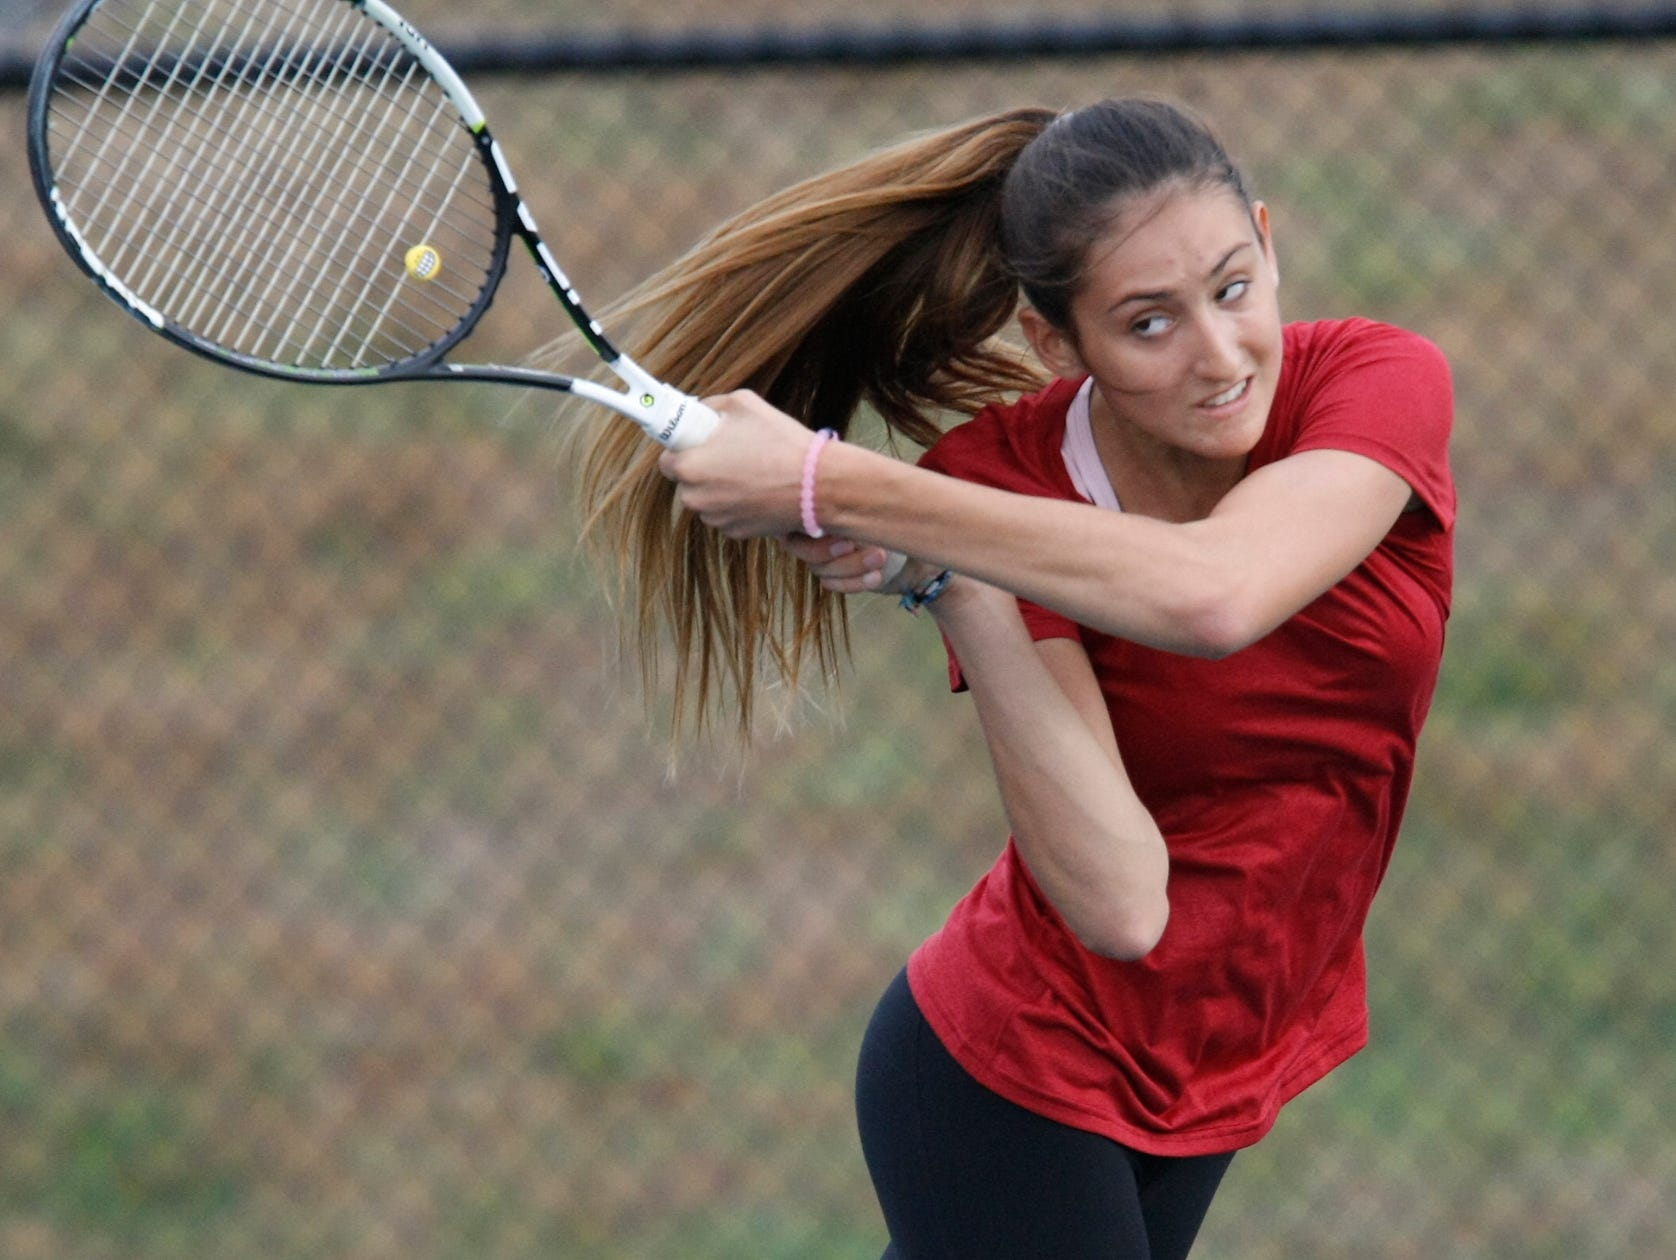 Arlington's Maranda Sears returns a volley during the girls sectional tennis finals at Harrison High School on Thursday, Oct. 22, 2015.